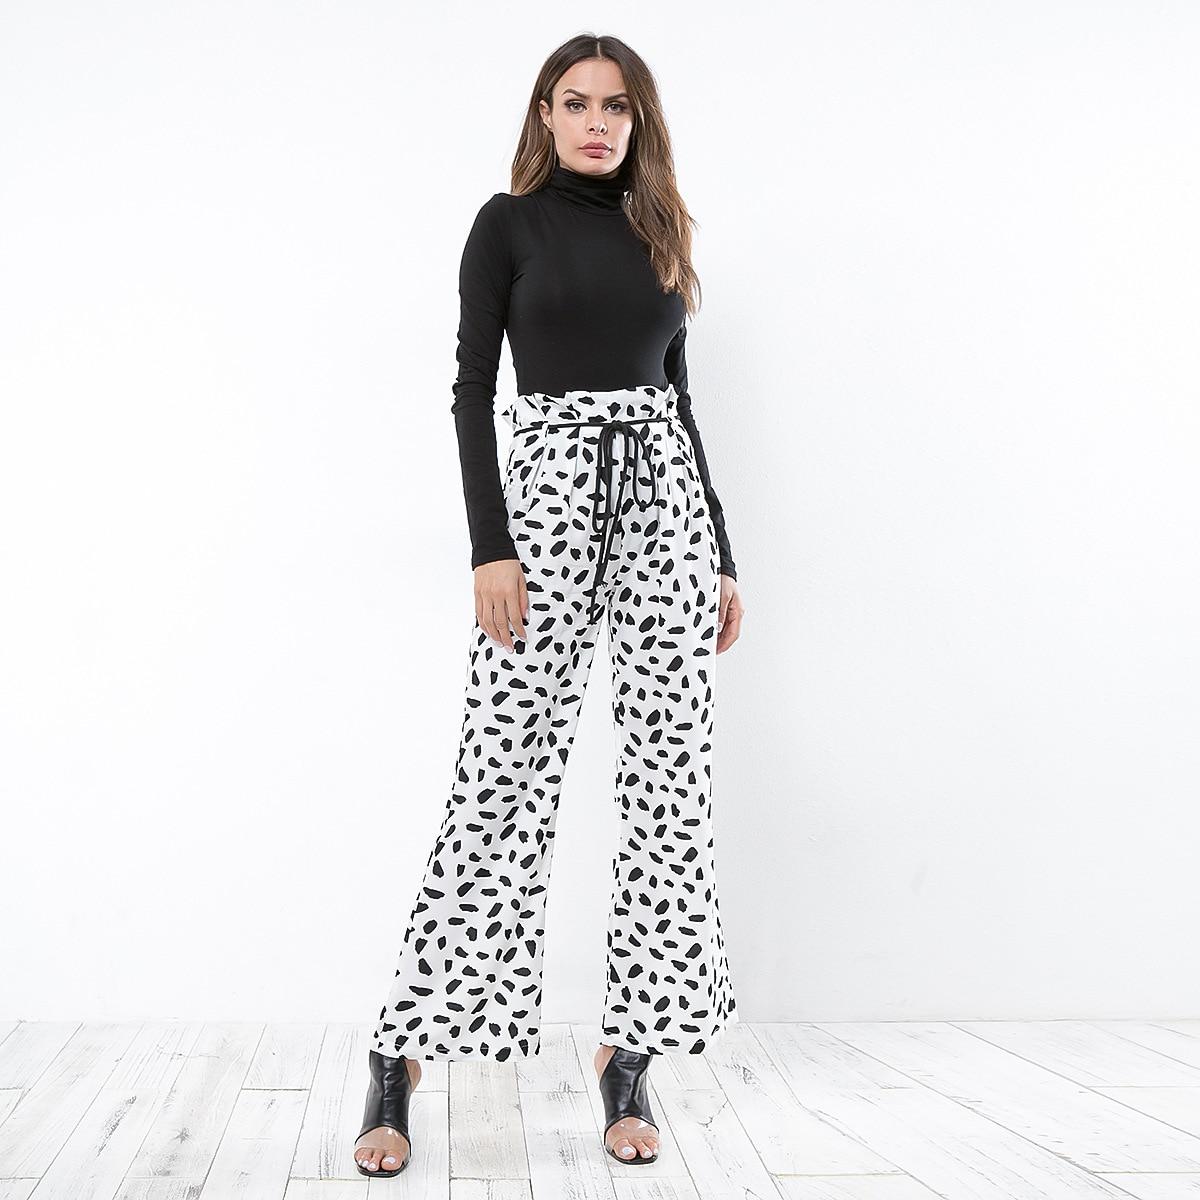 Casual Printed Wide Leg Women   Pants     Capris   High Waist Dot Loose Female Trousers Streetwear Ladies Drawstring Waist   Pants   Bottoms